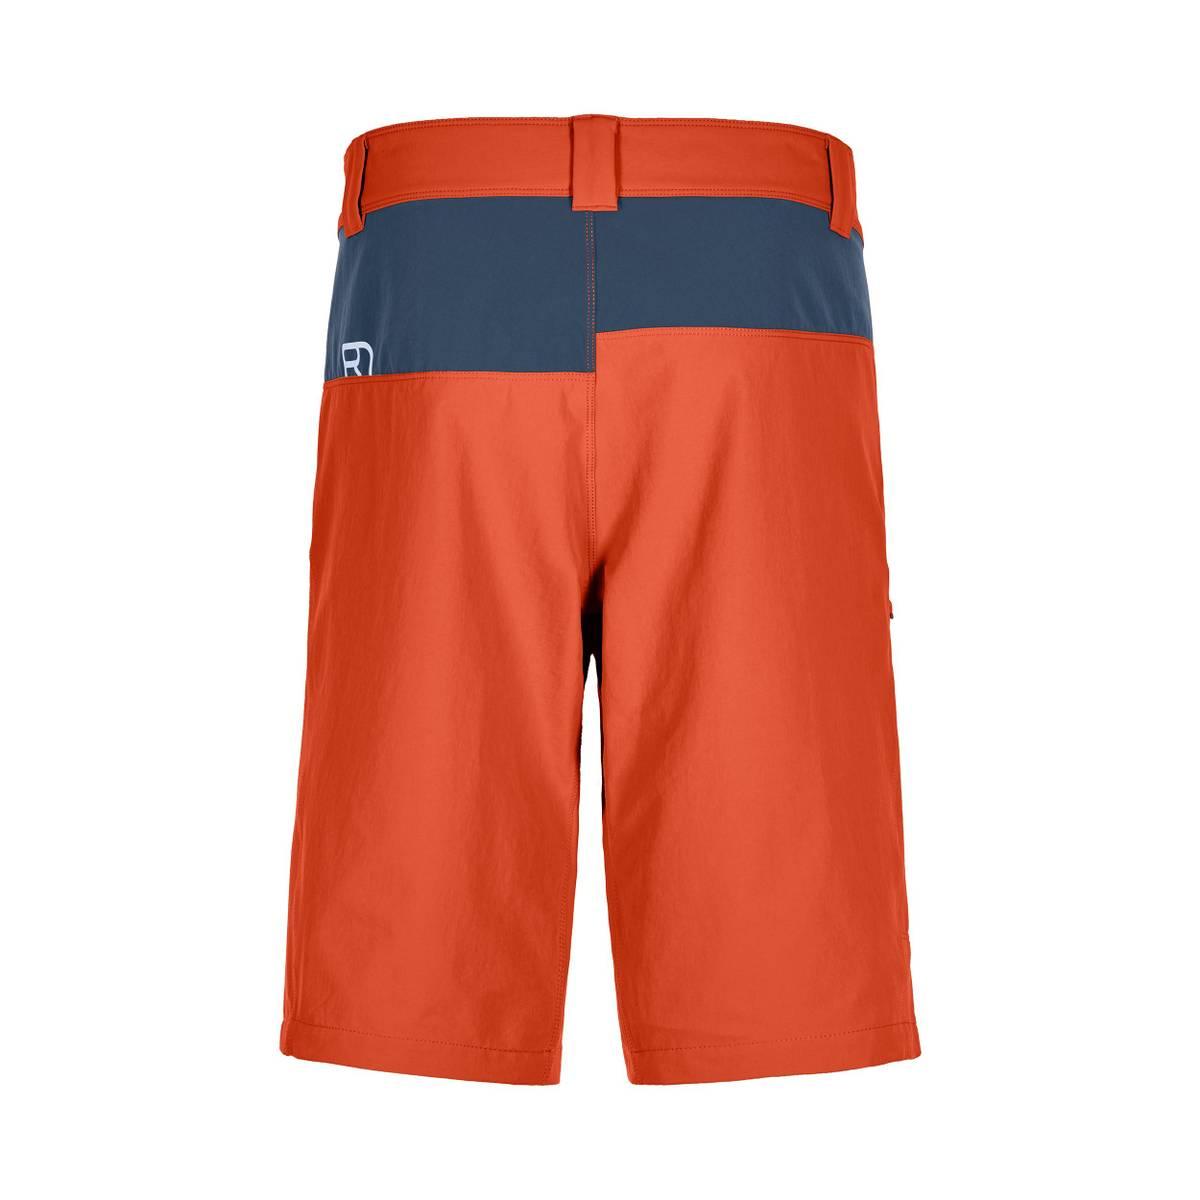 Ortovox Pelmo Shorts M desert orange